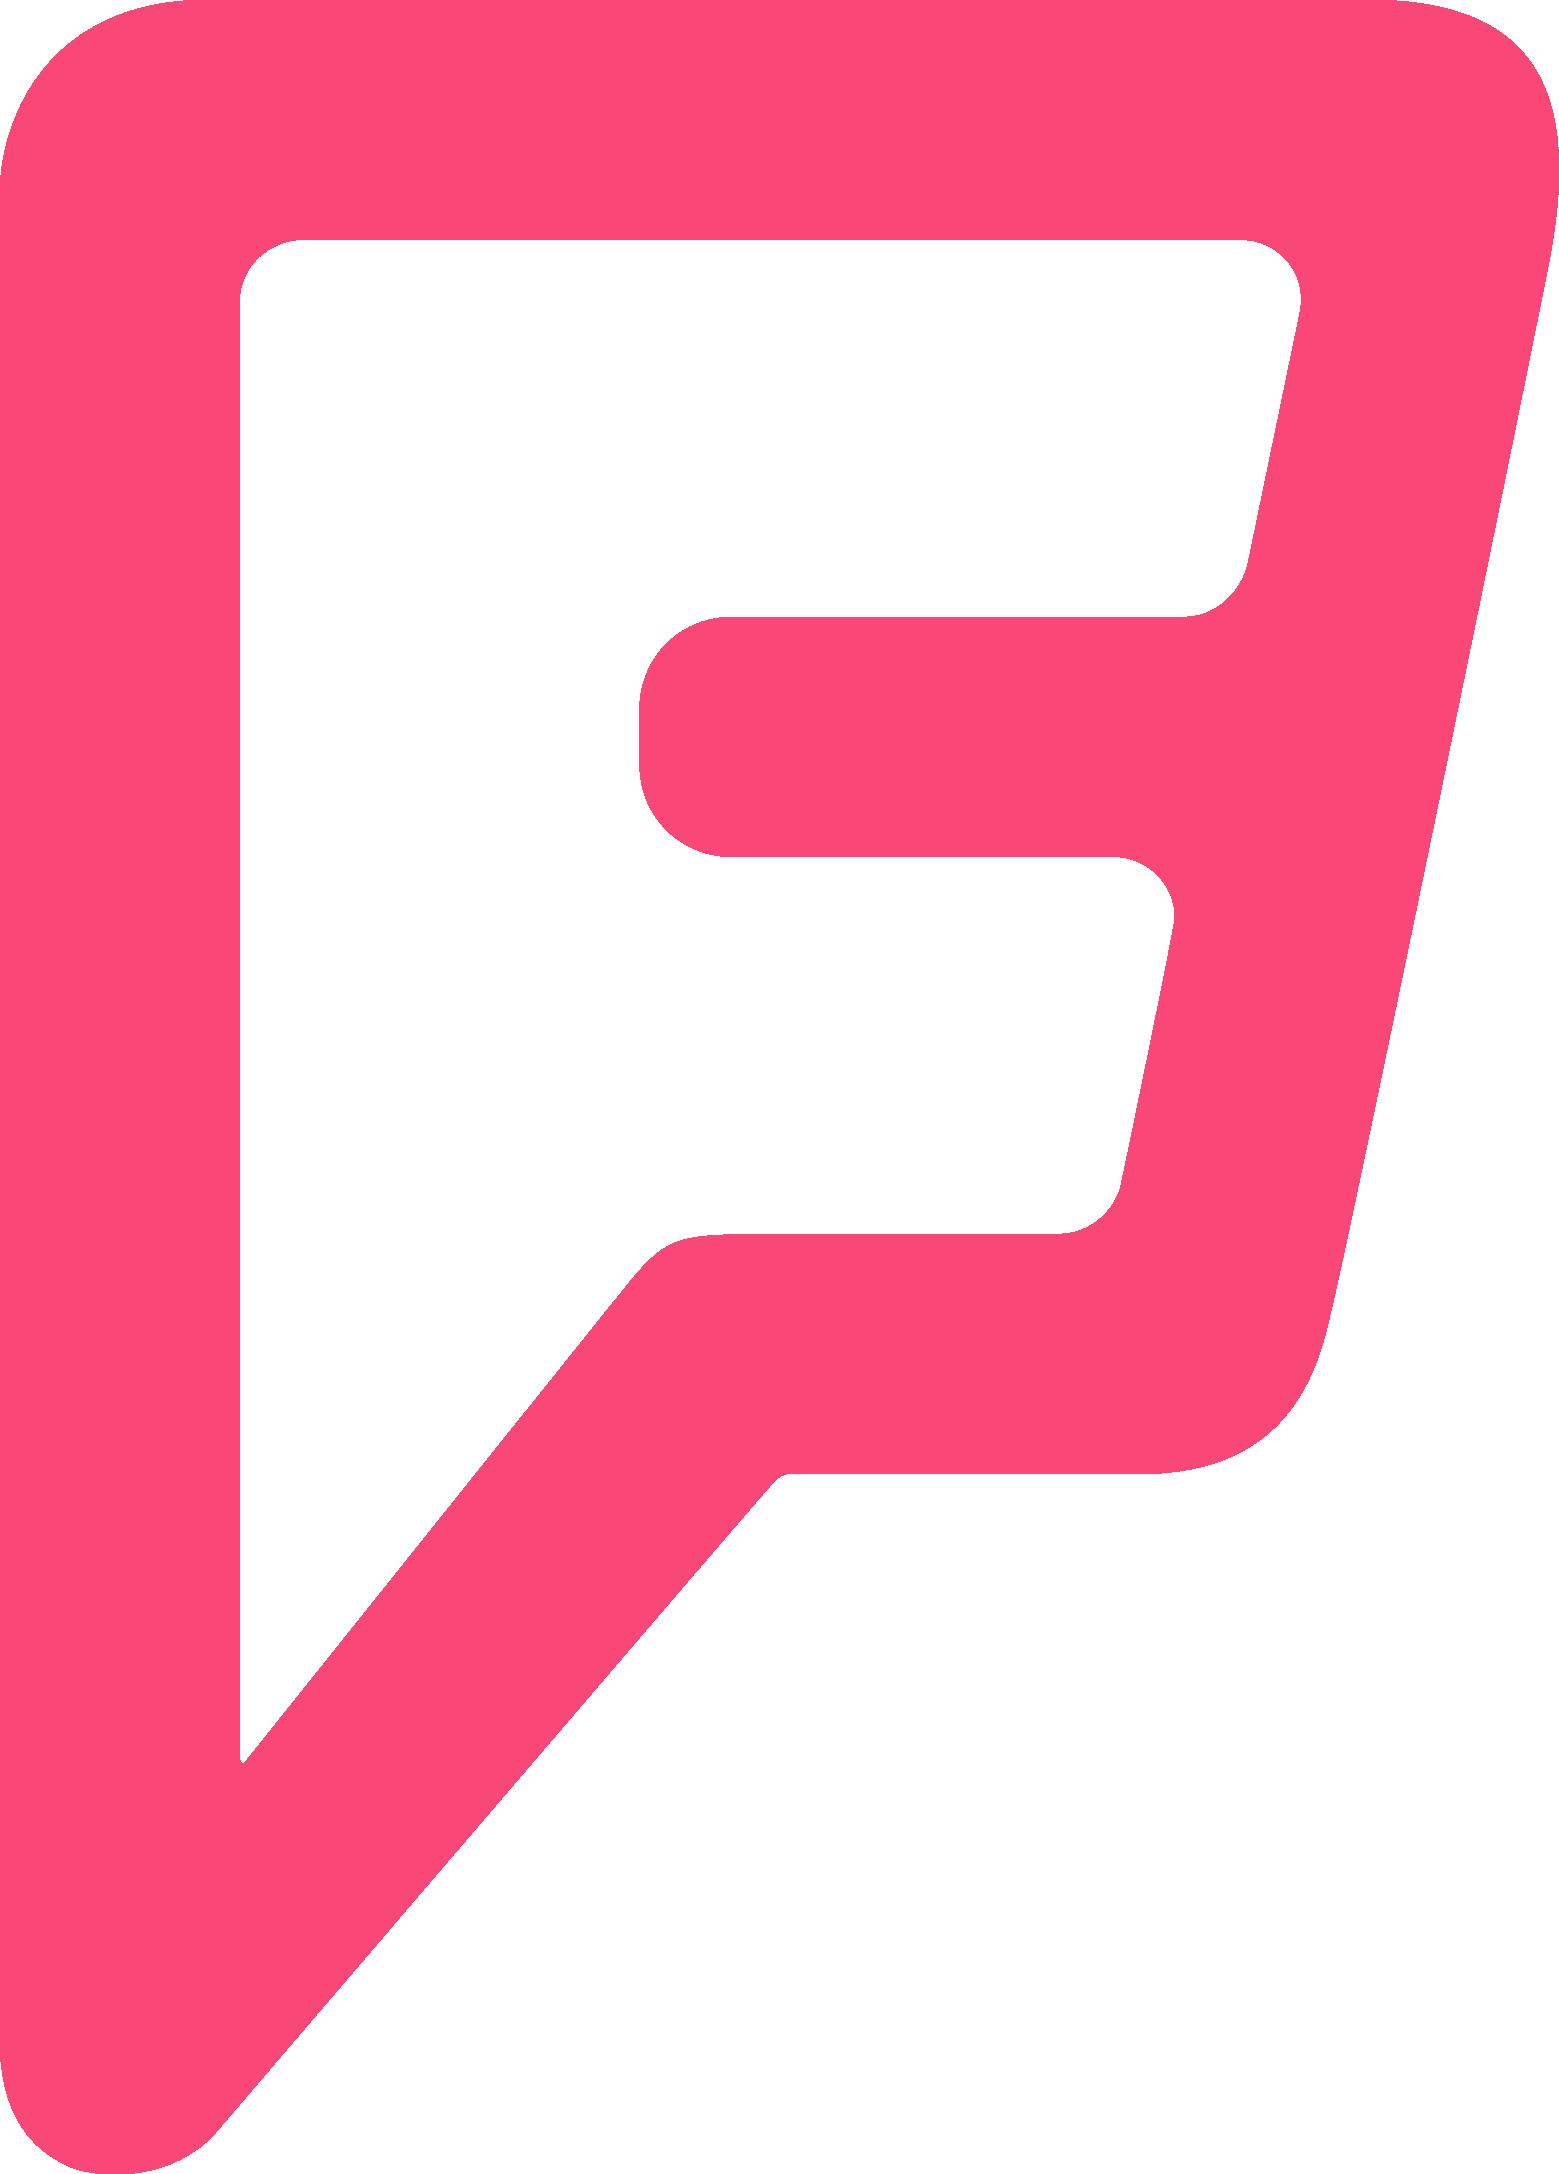 Foursquare New Logo Pdf Png Free Downloads Logo Brand Emblems Logo Pdf Four Square Logos